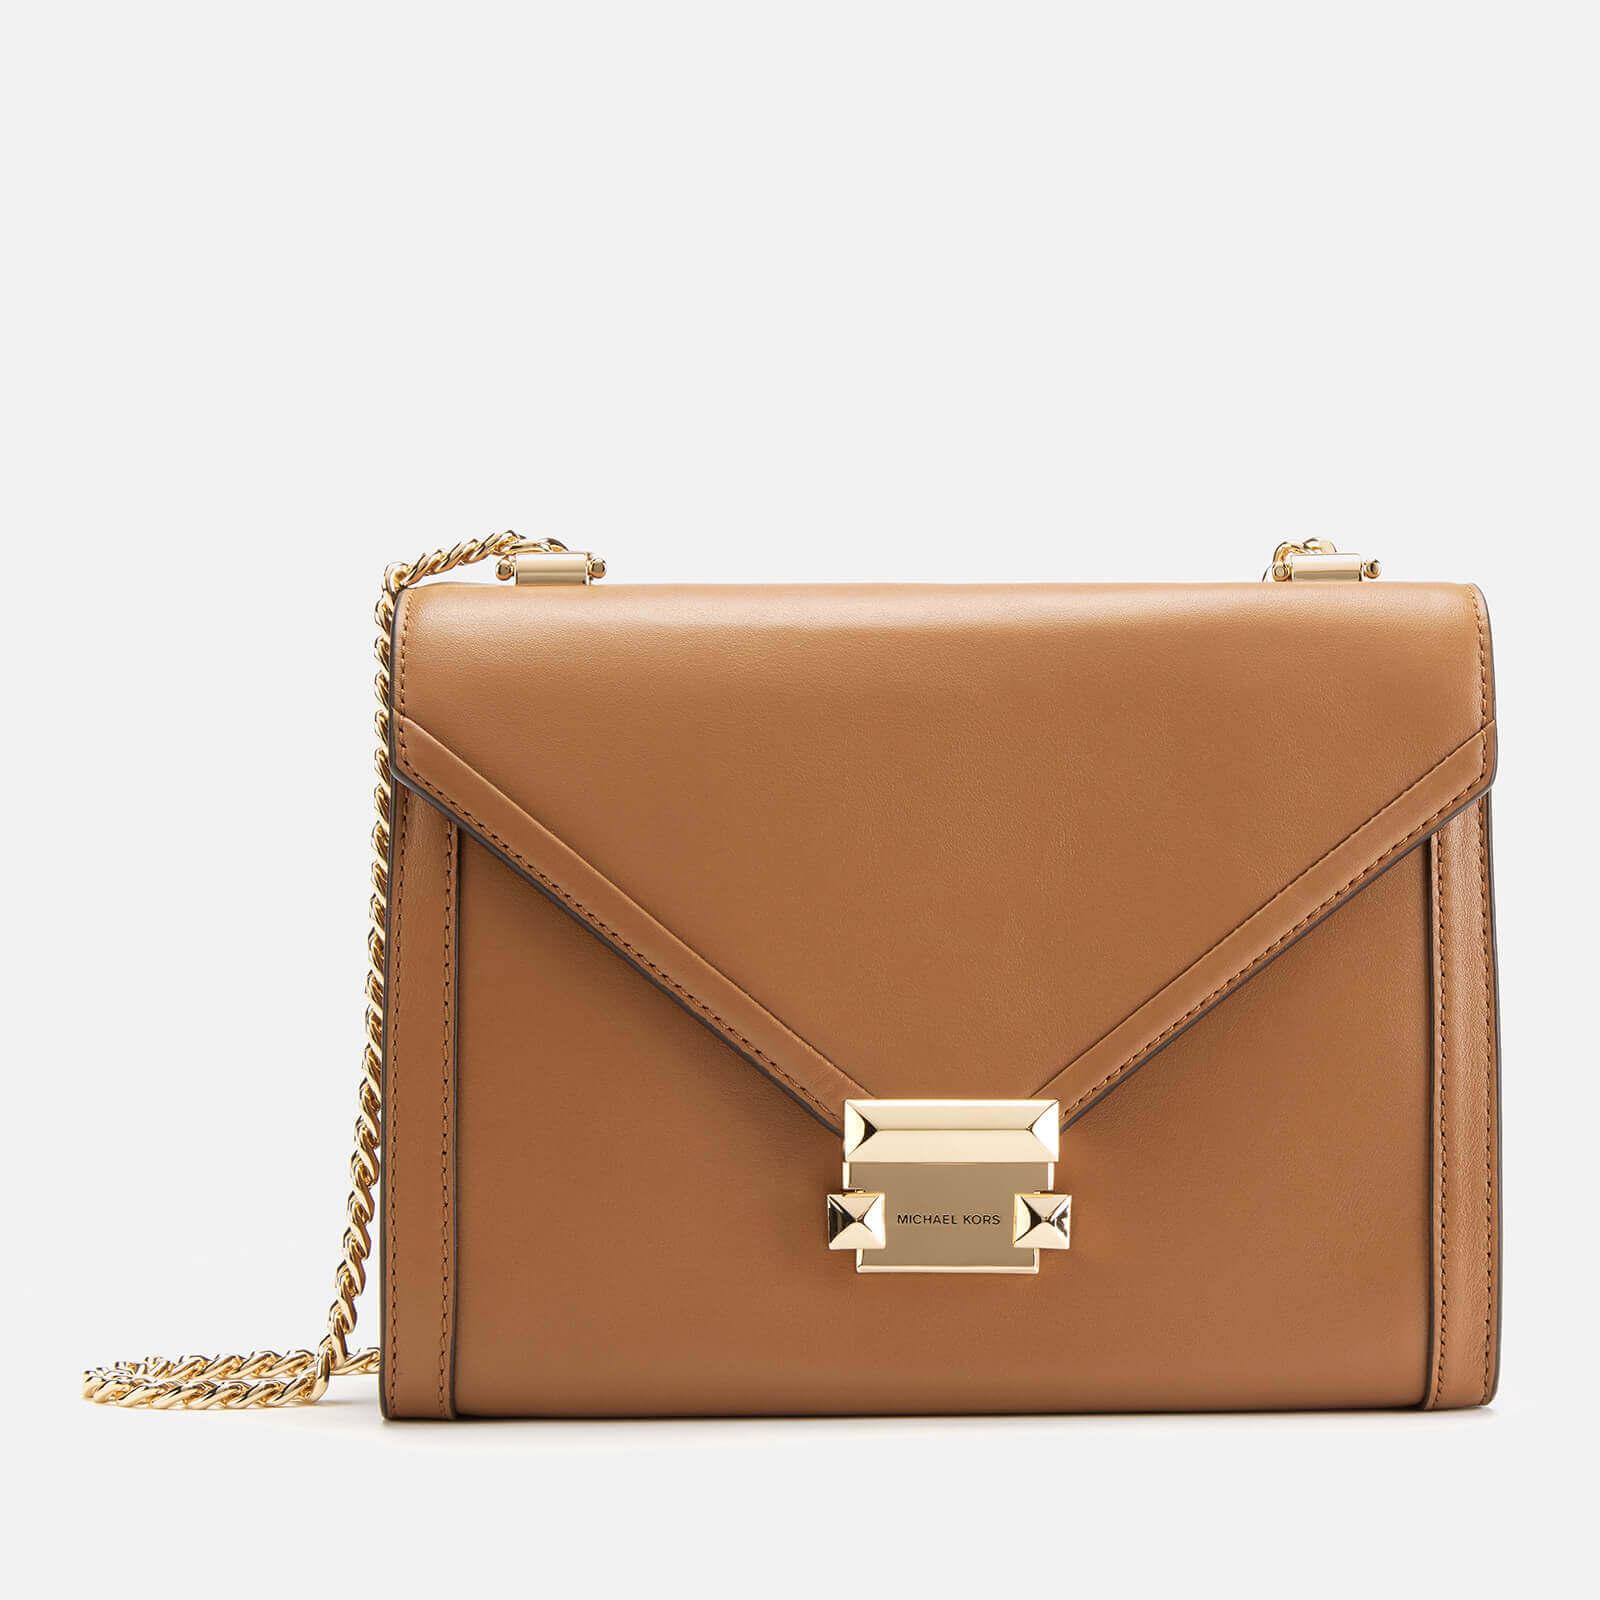 MICHAEL MICHAEL KORS Women's Whitney Large Shoulder Bag - Acorn